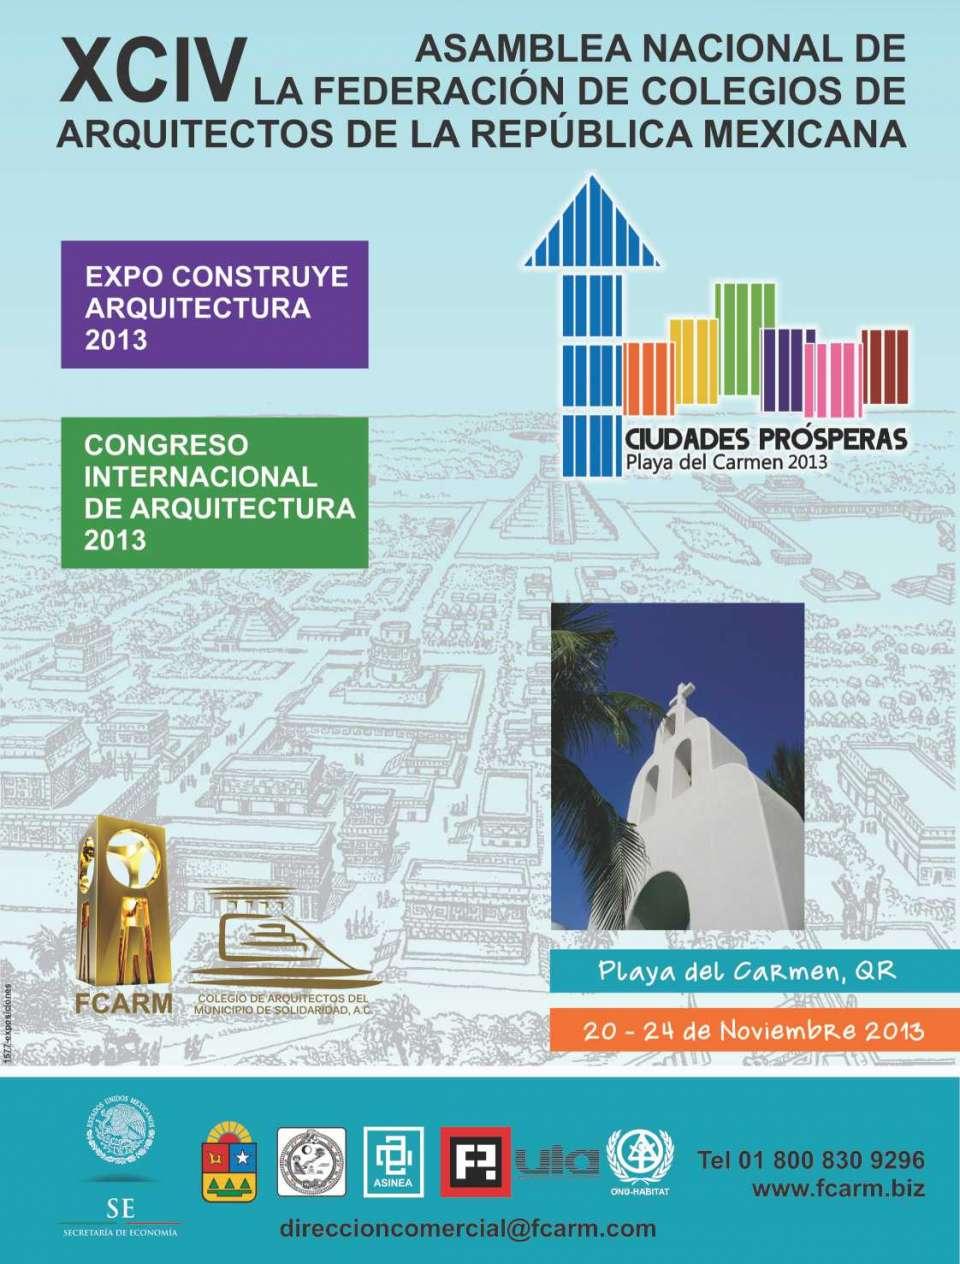 XCIV Asamblea Nacional de la Federacion de Colegios de Arquitectos de la Republica Mexicana, Expo Construye Arquitectura 2013, 20 al 24 de Noviembre 2013, Playa del Carmen, Q.Roo.